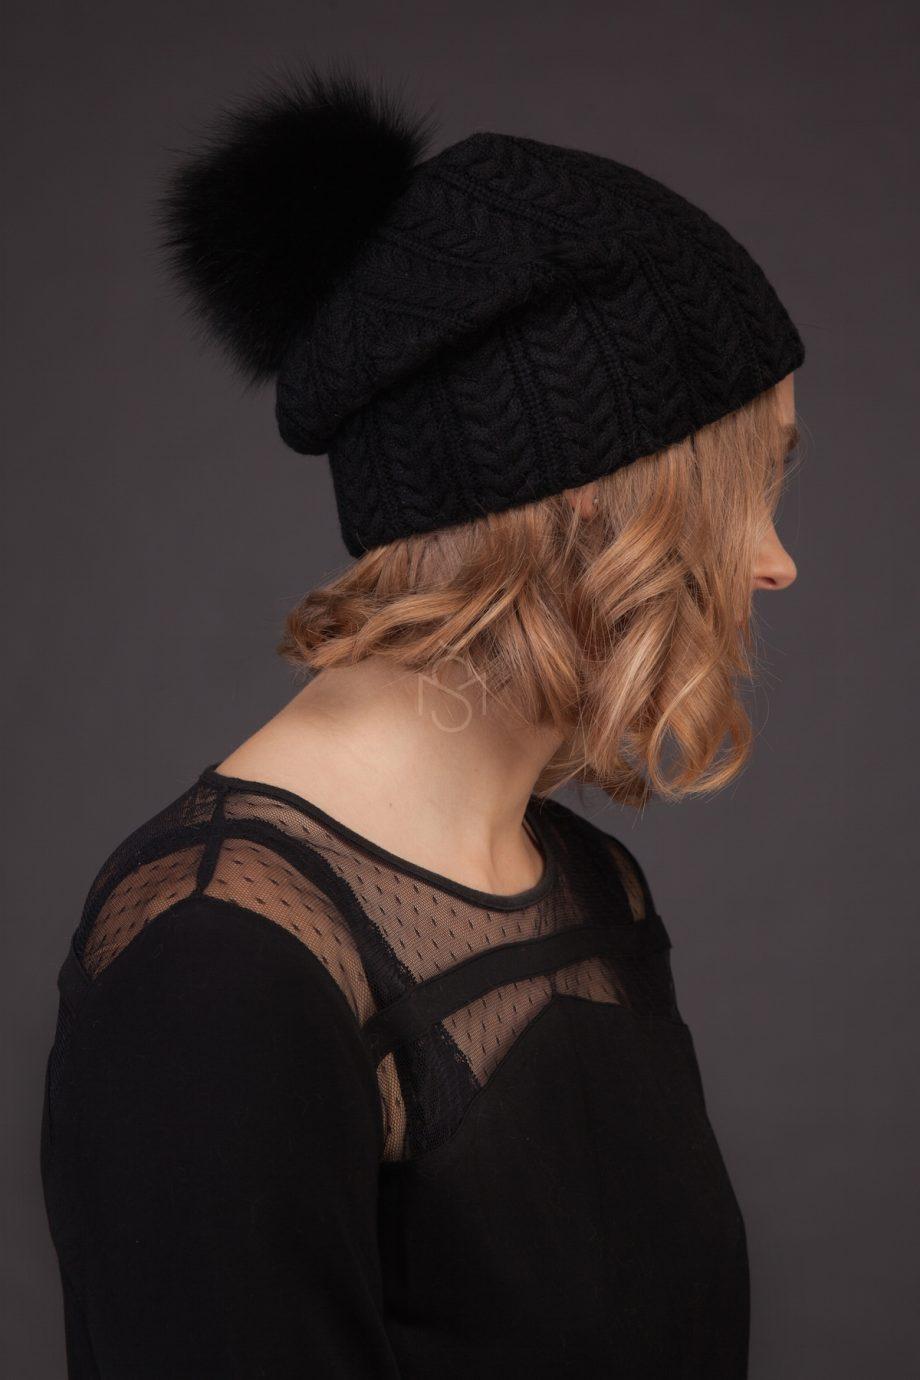 Cashmere hat with fox fur pom_pom_black_made by SILTA MADA fur studio in Vilnius